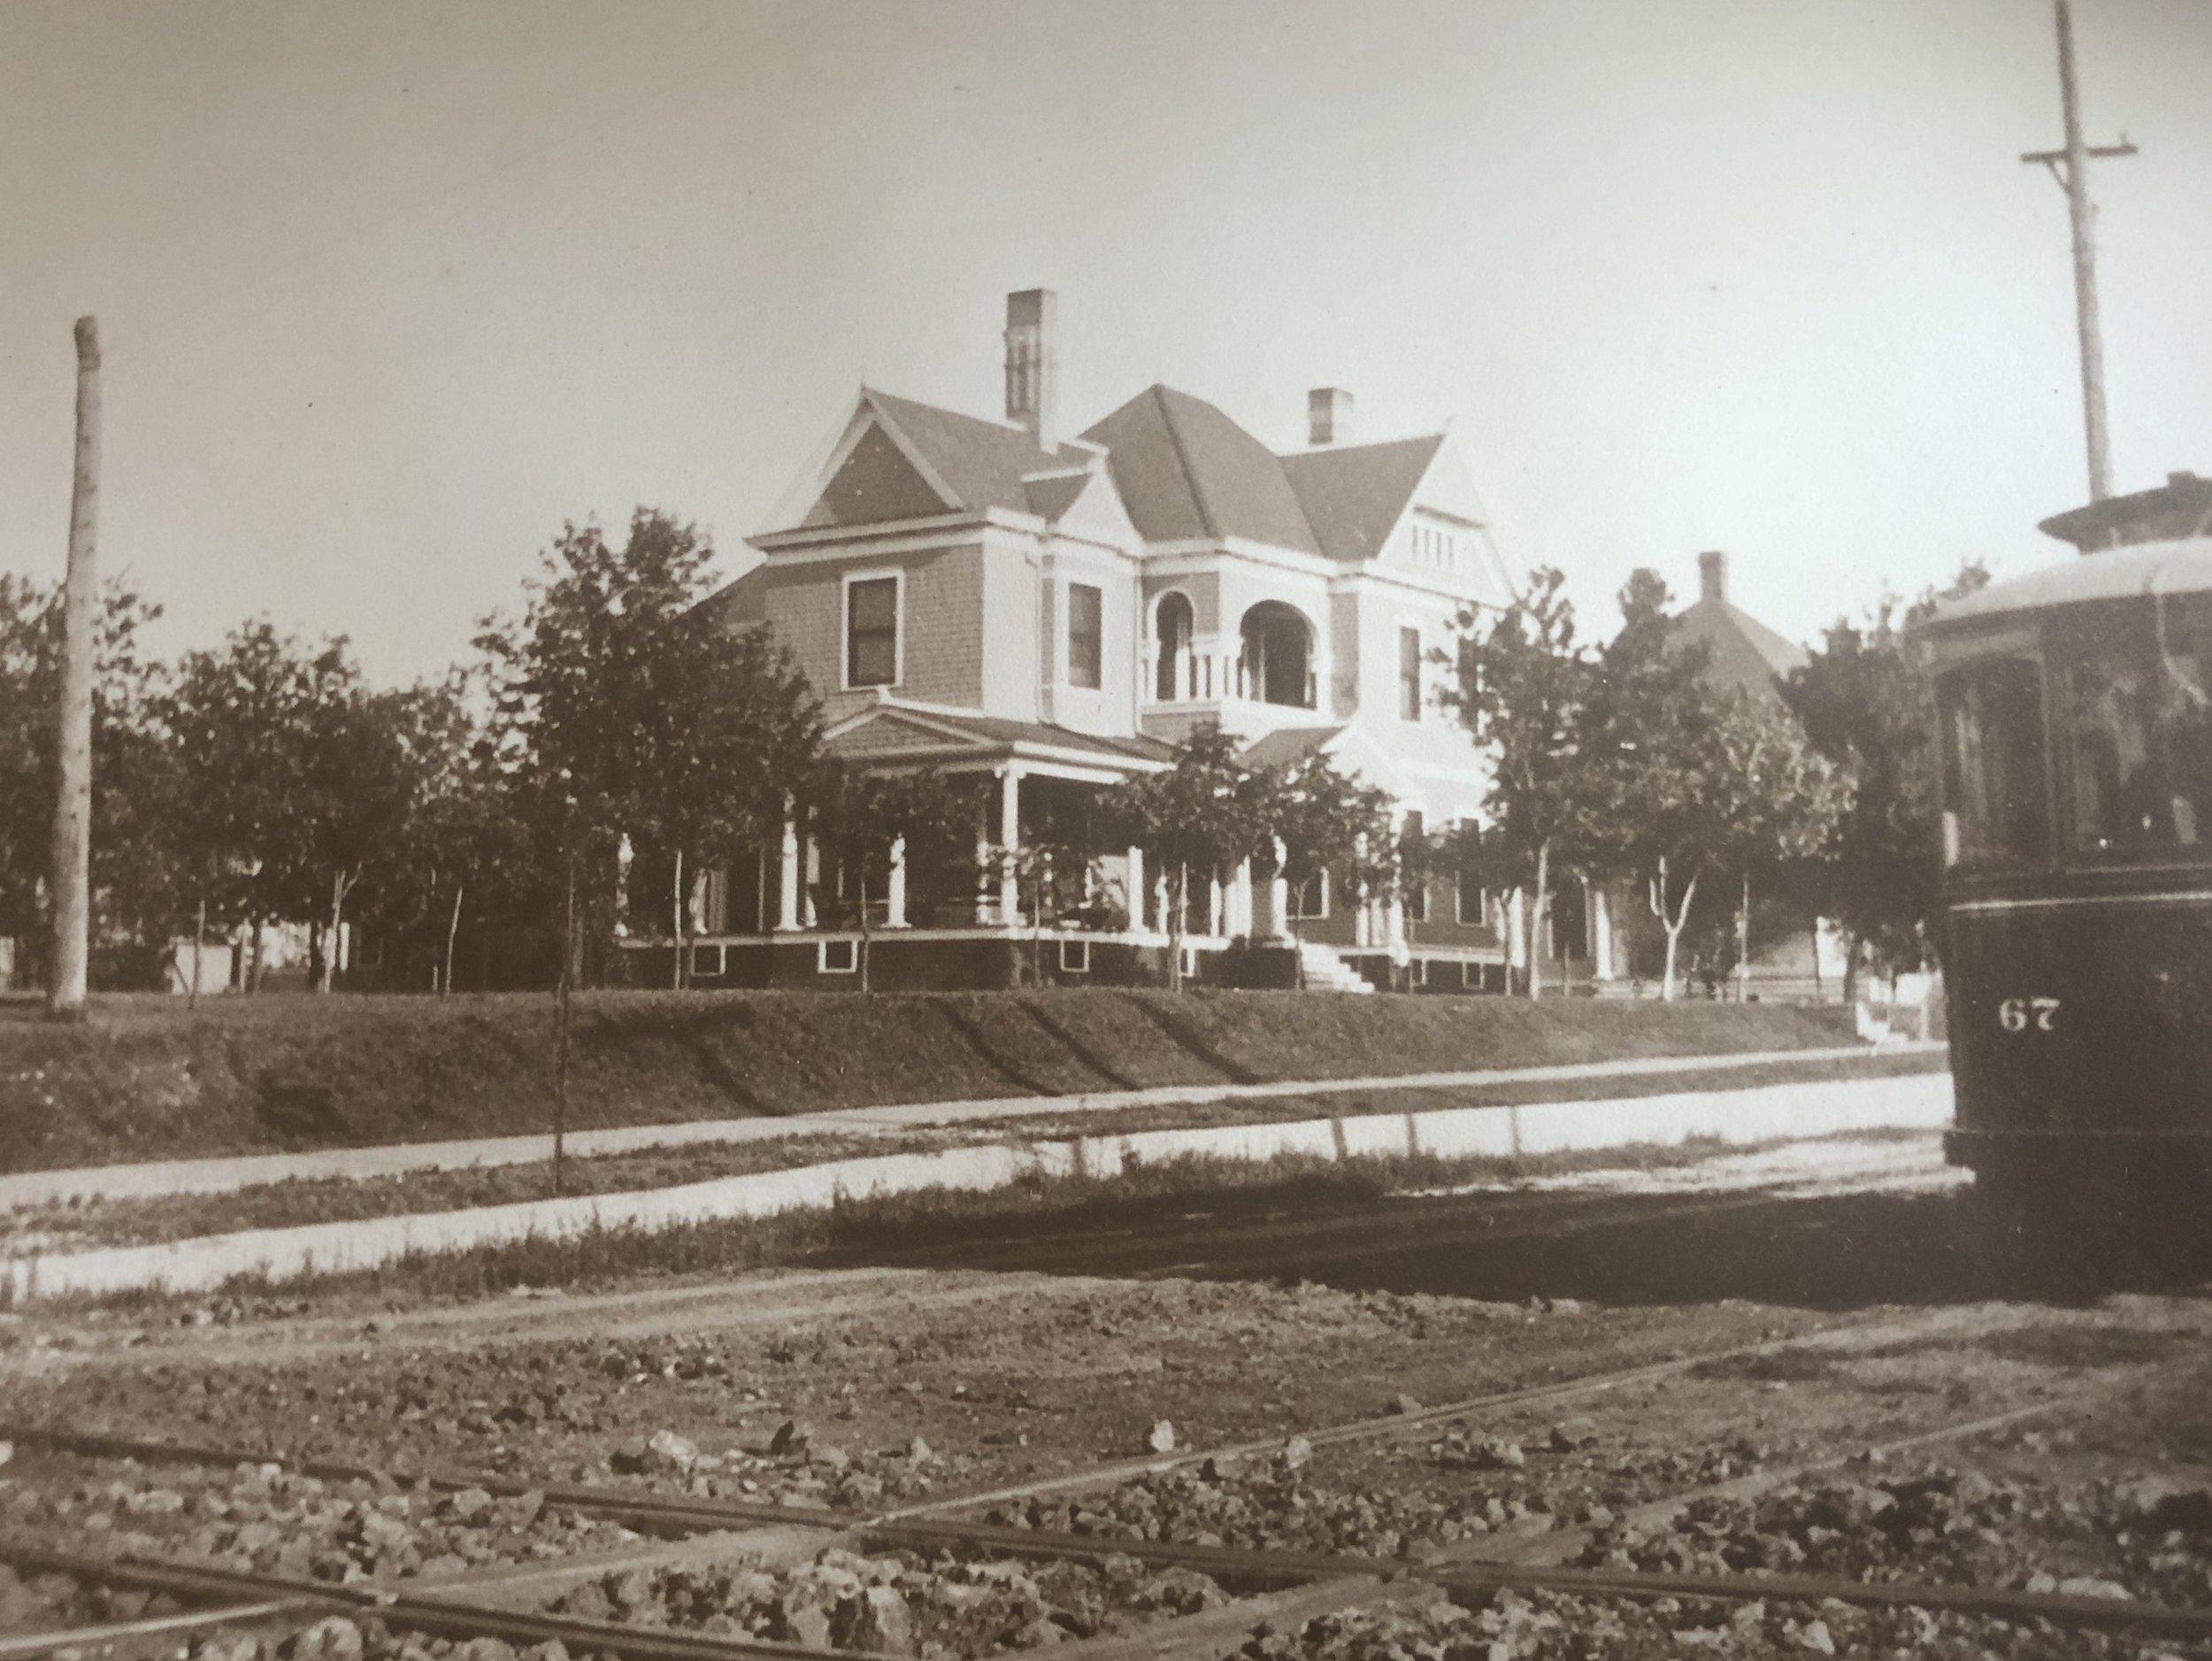 Brown-Tuck Mansion